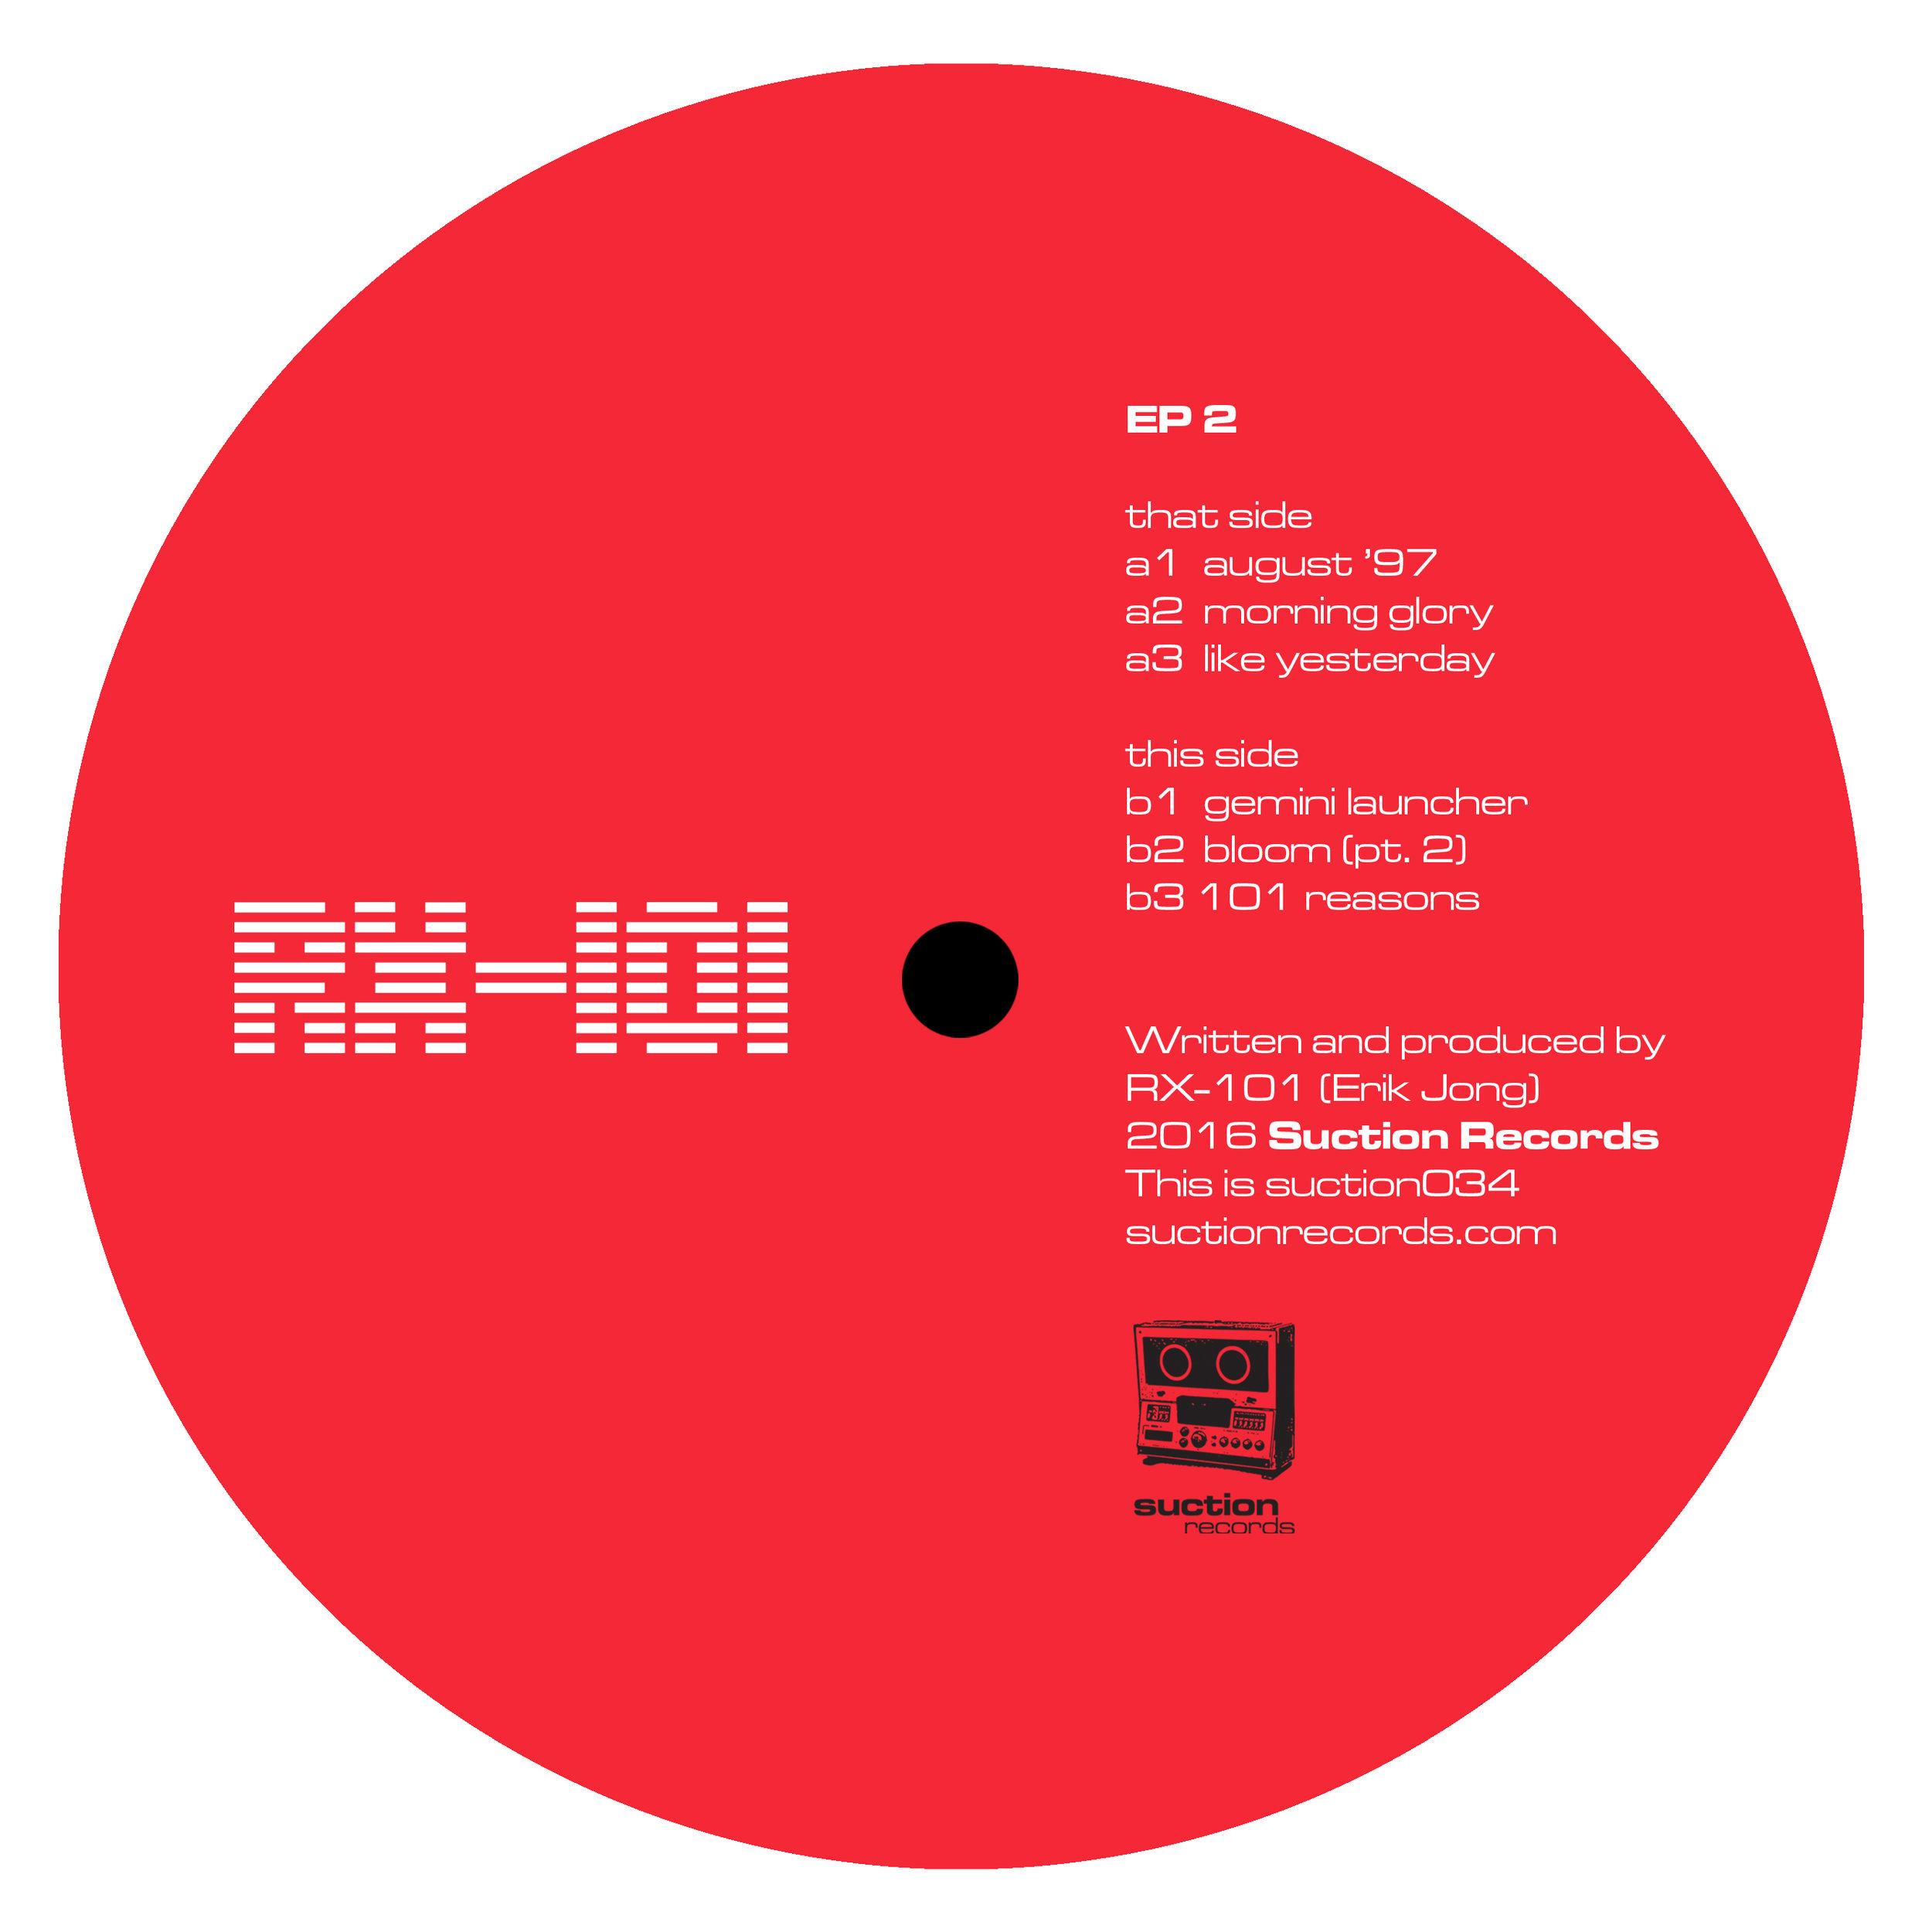 RX-101_EP_2_Label_B.jpg